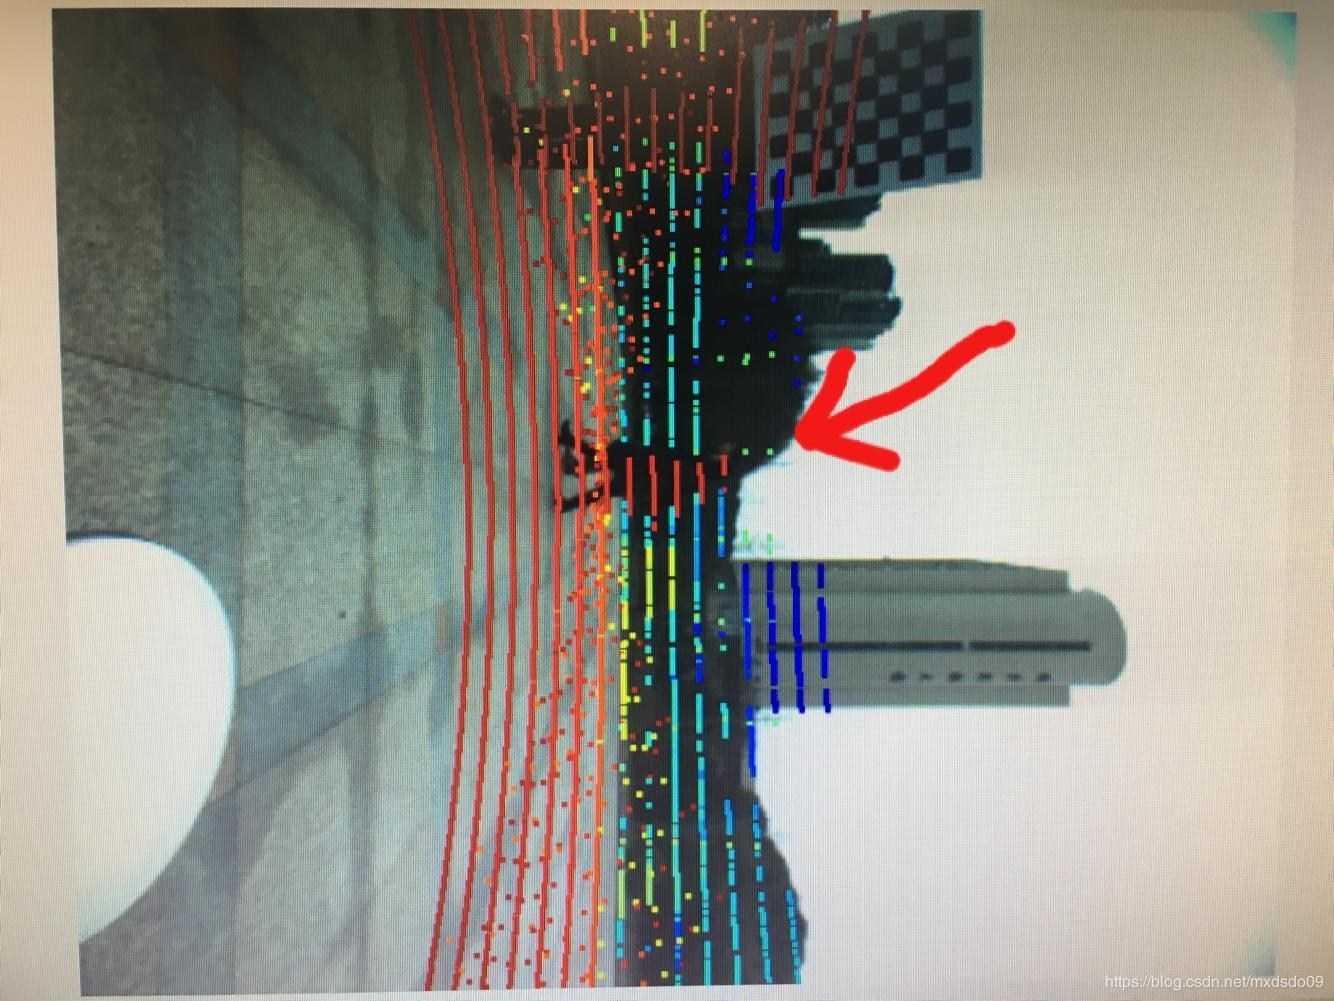 Laser radar (lidar) and camera (camera) joint calibration